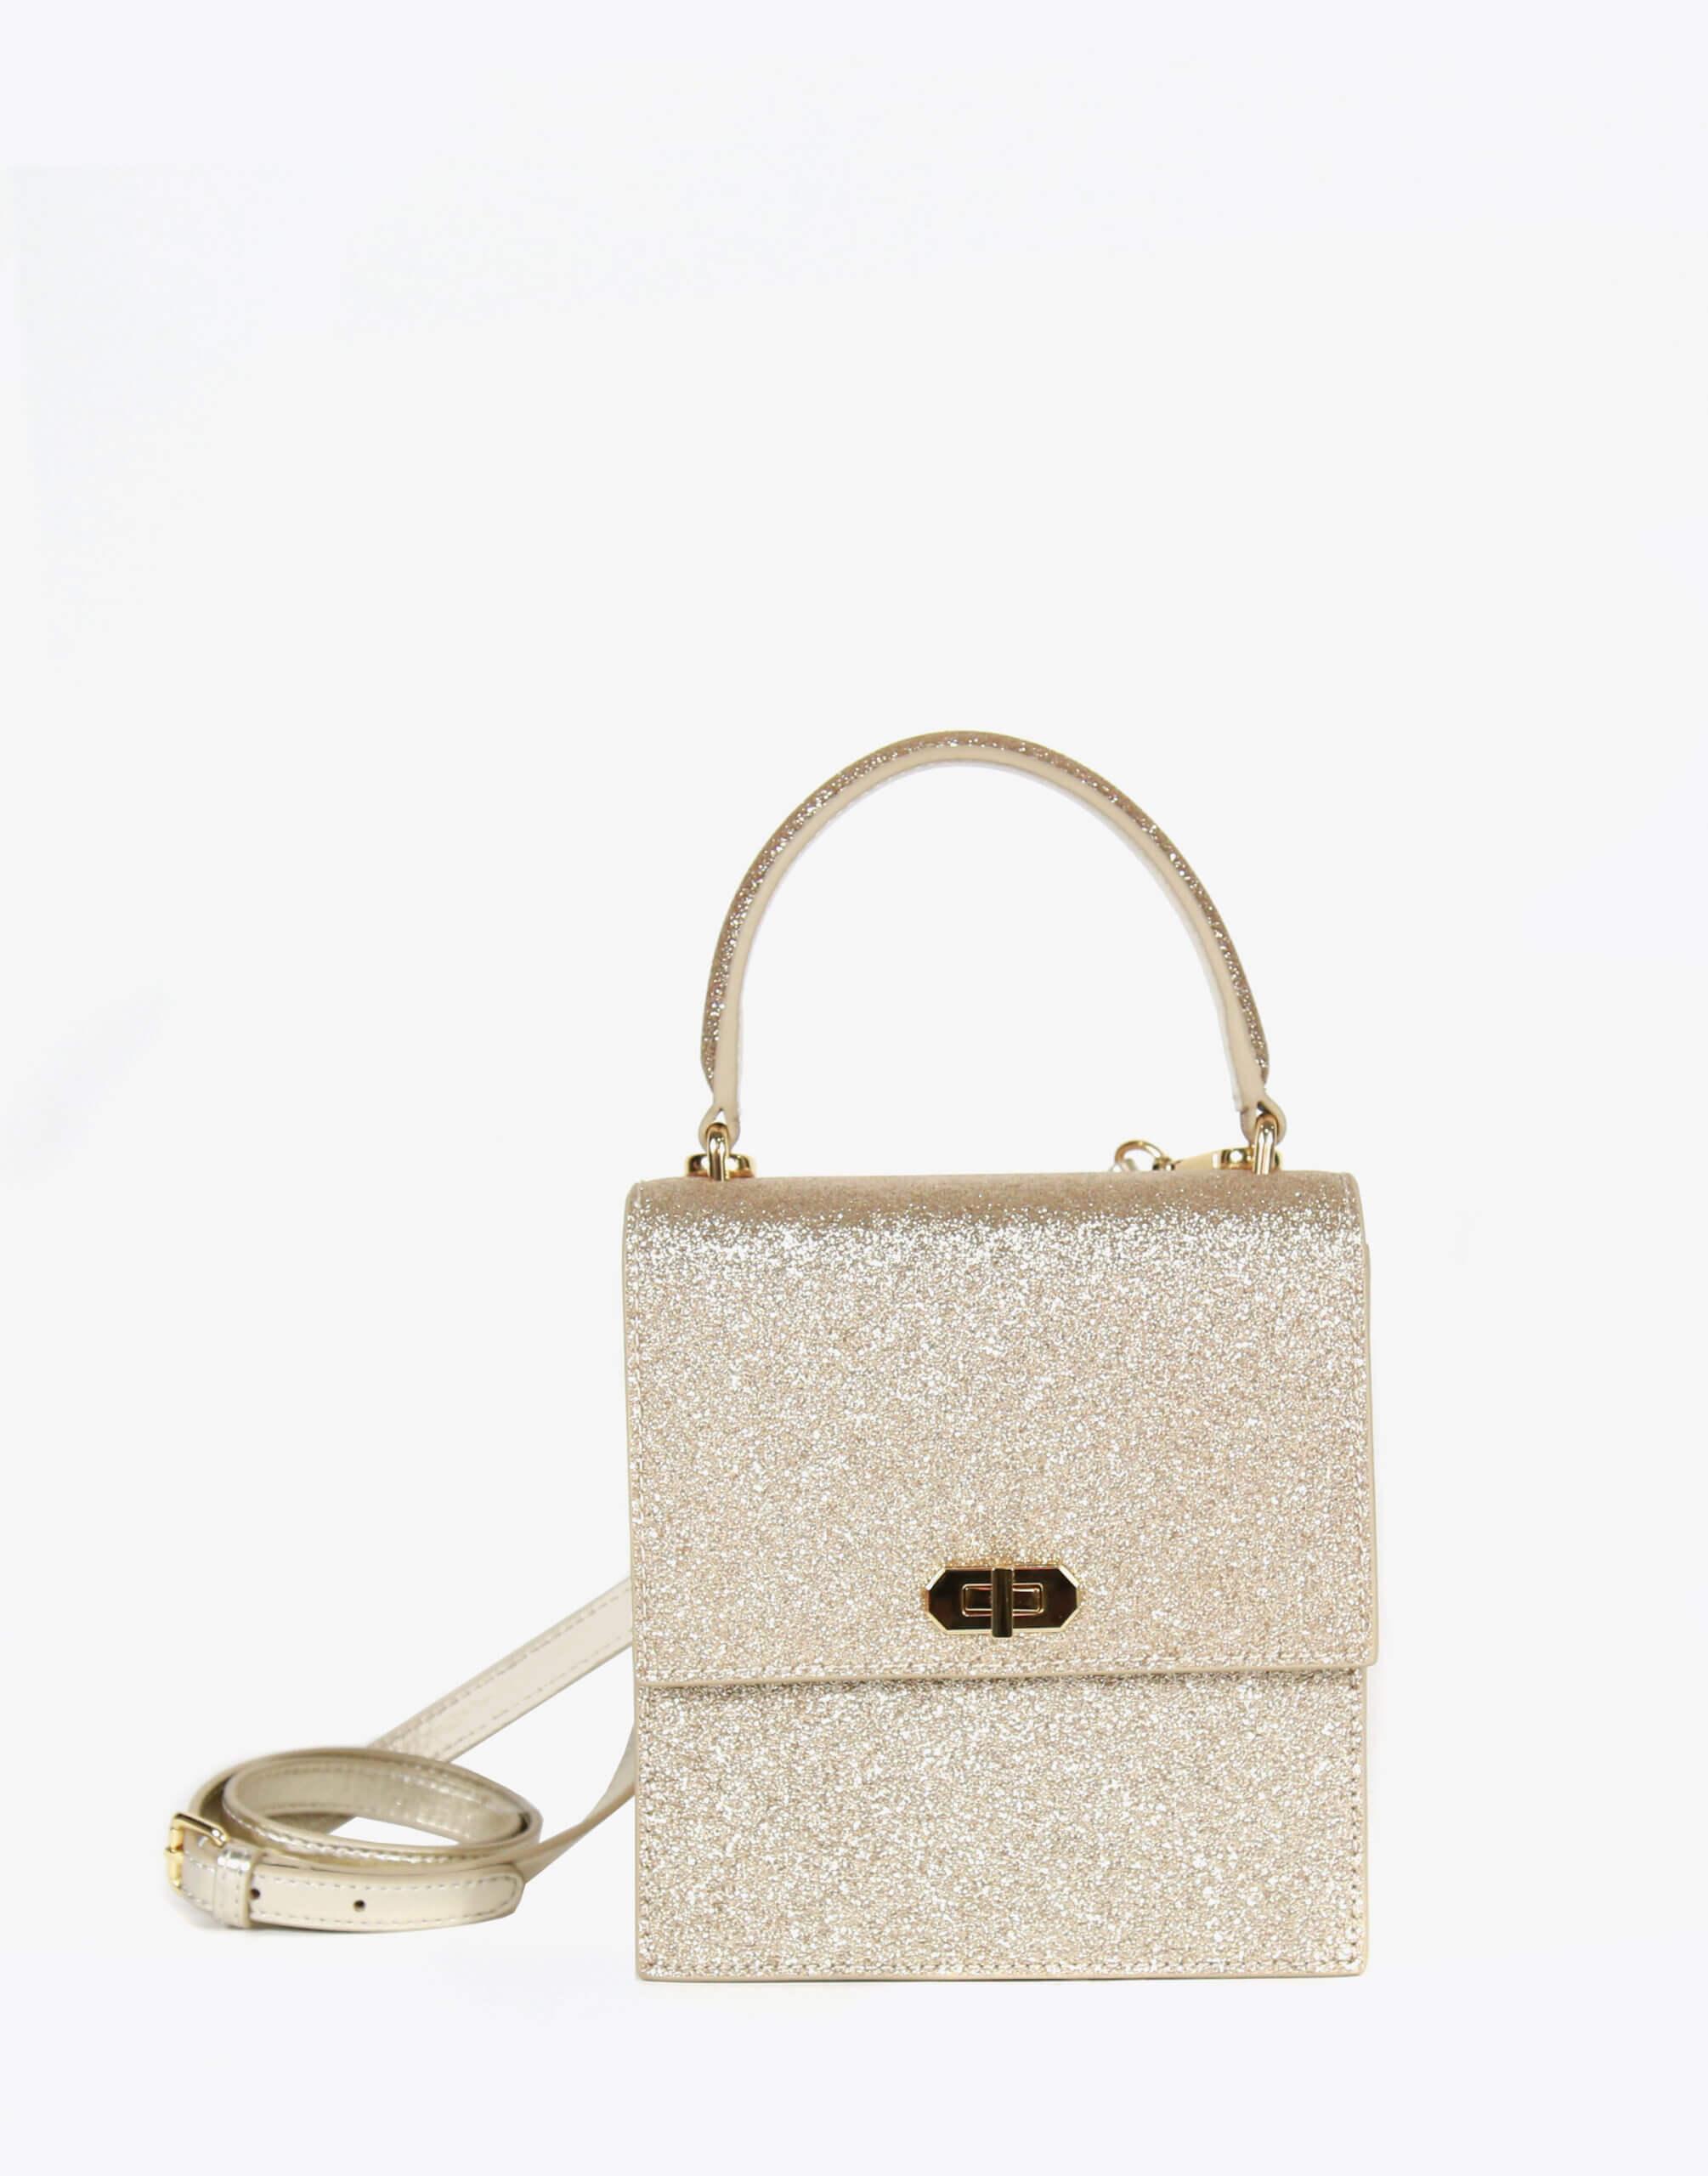 Neely & Chloe No. 19 Mini Lady Bag Strap View Gold